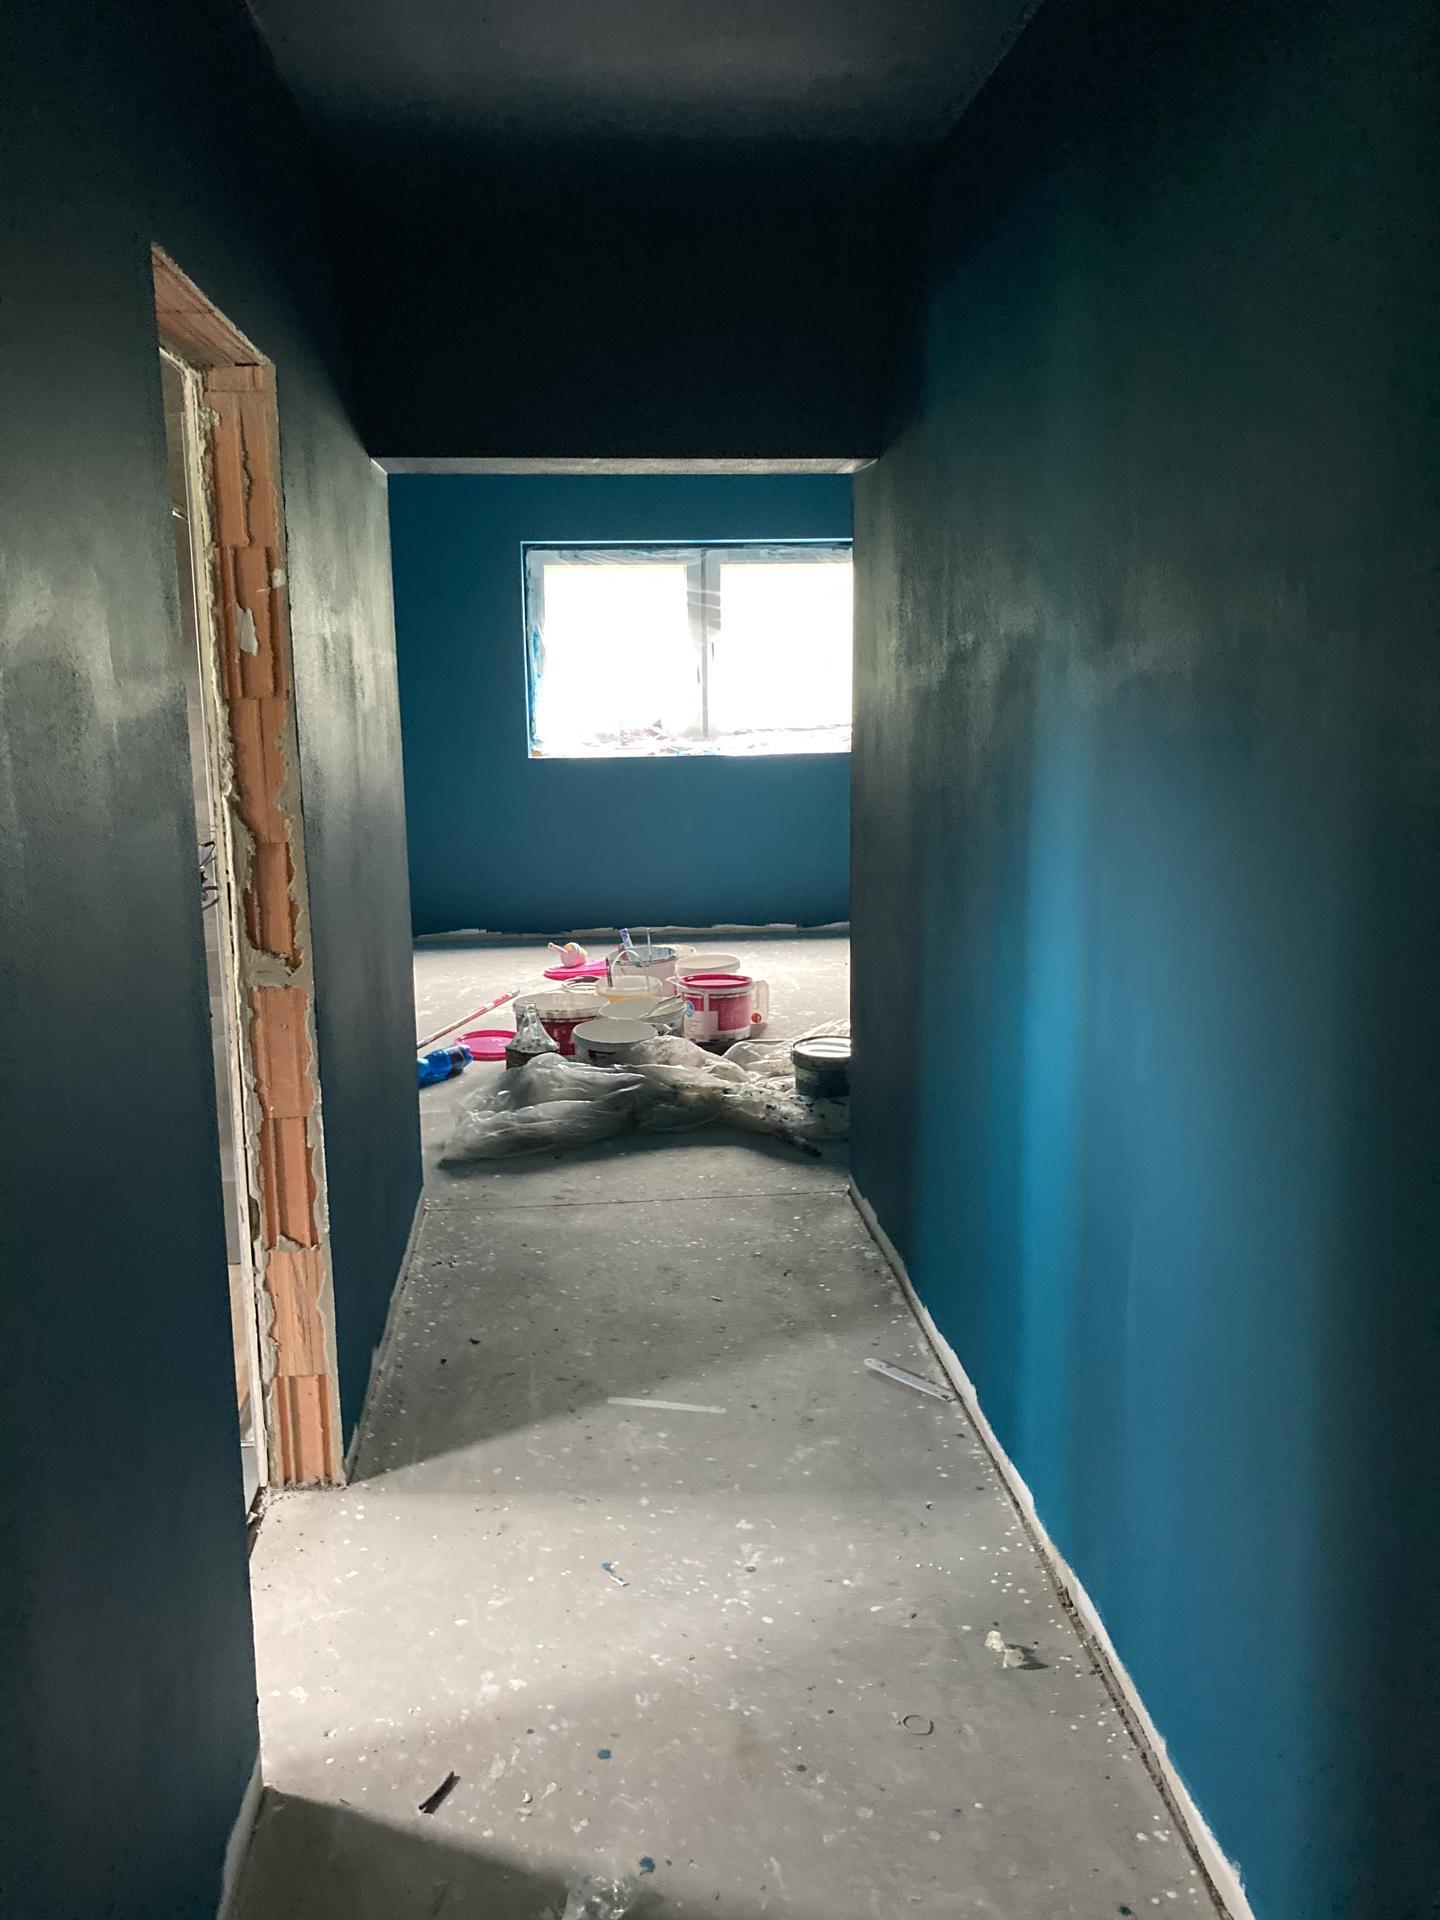 Trosku sme si uleteli a ideme mat tmavú spálňu :) prvá foto je inšpirácia - Obrázok č. 2